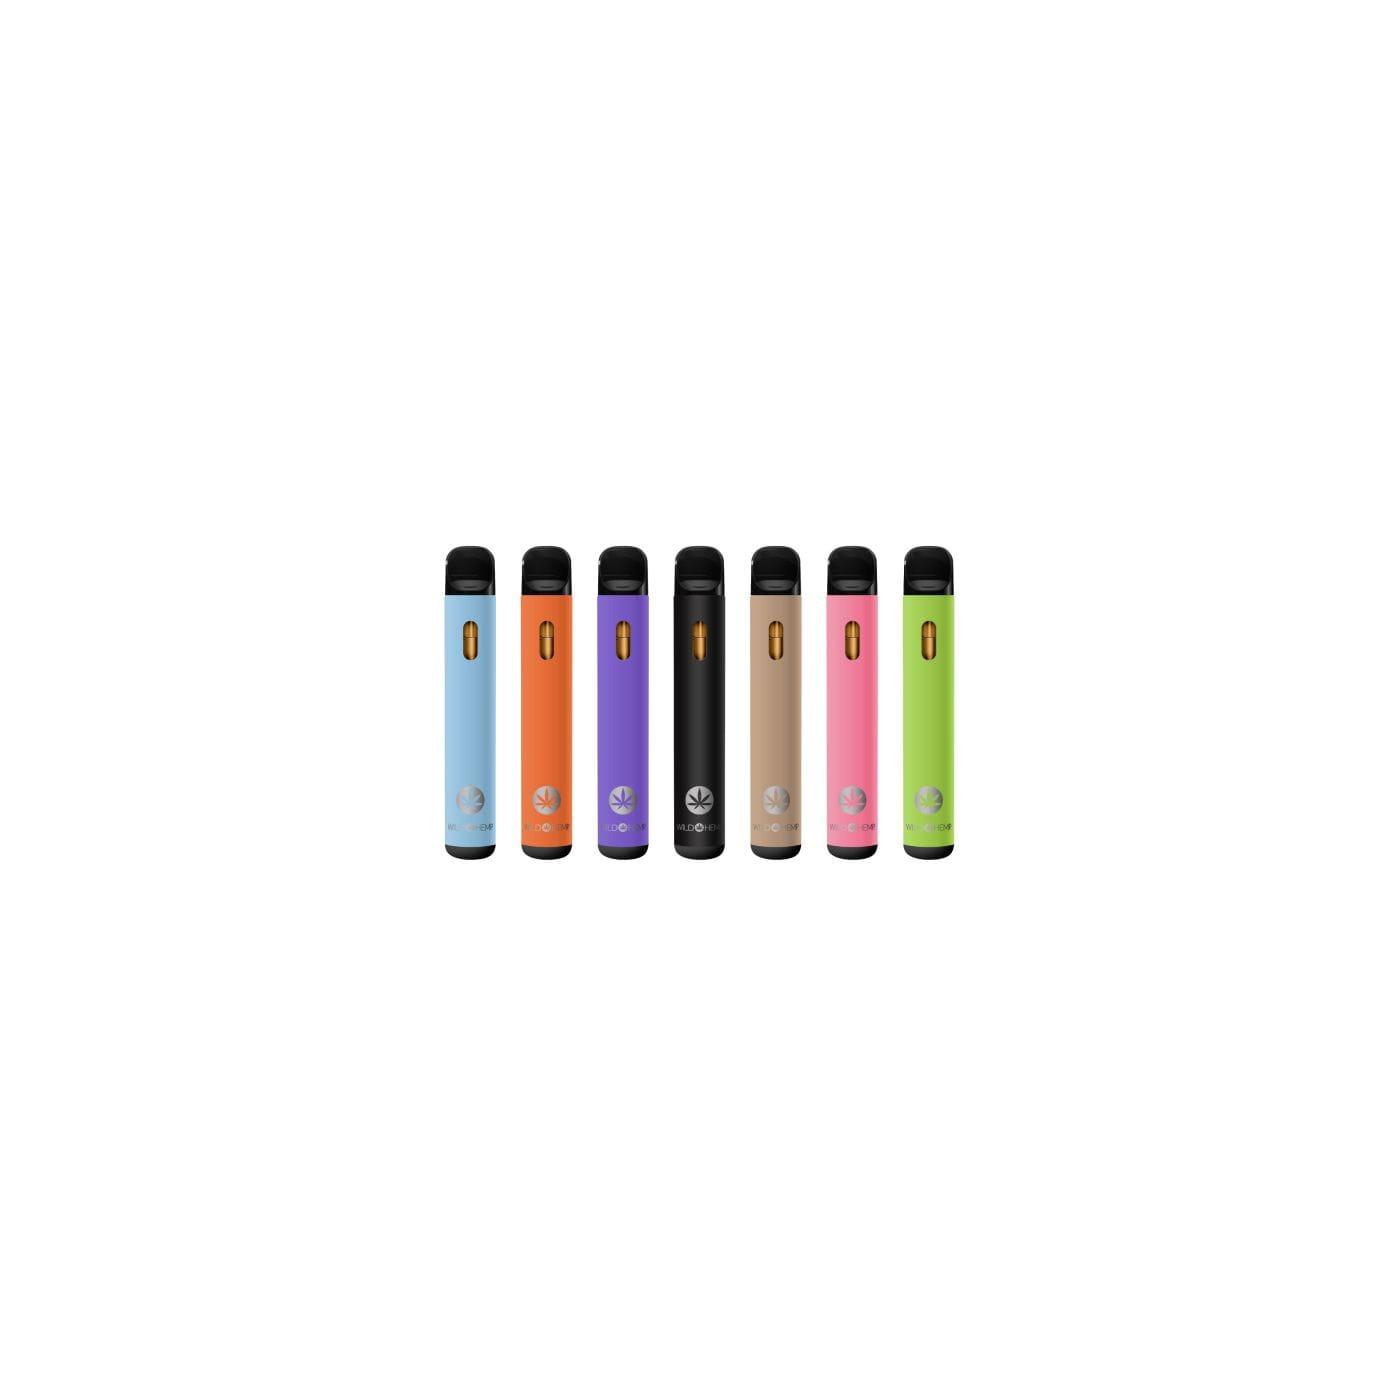 Wild Hemp X Smok CBD Disposable - 5 Pack